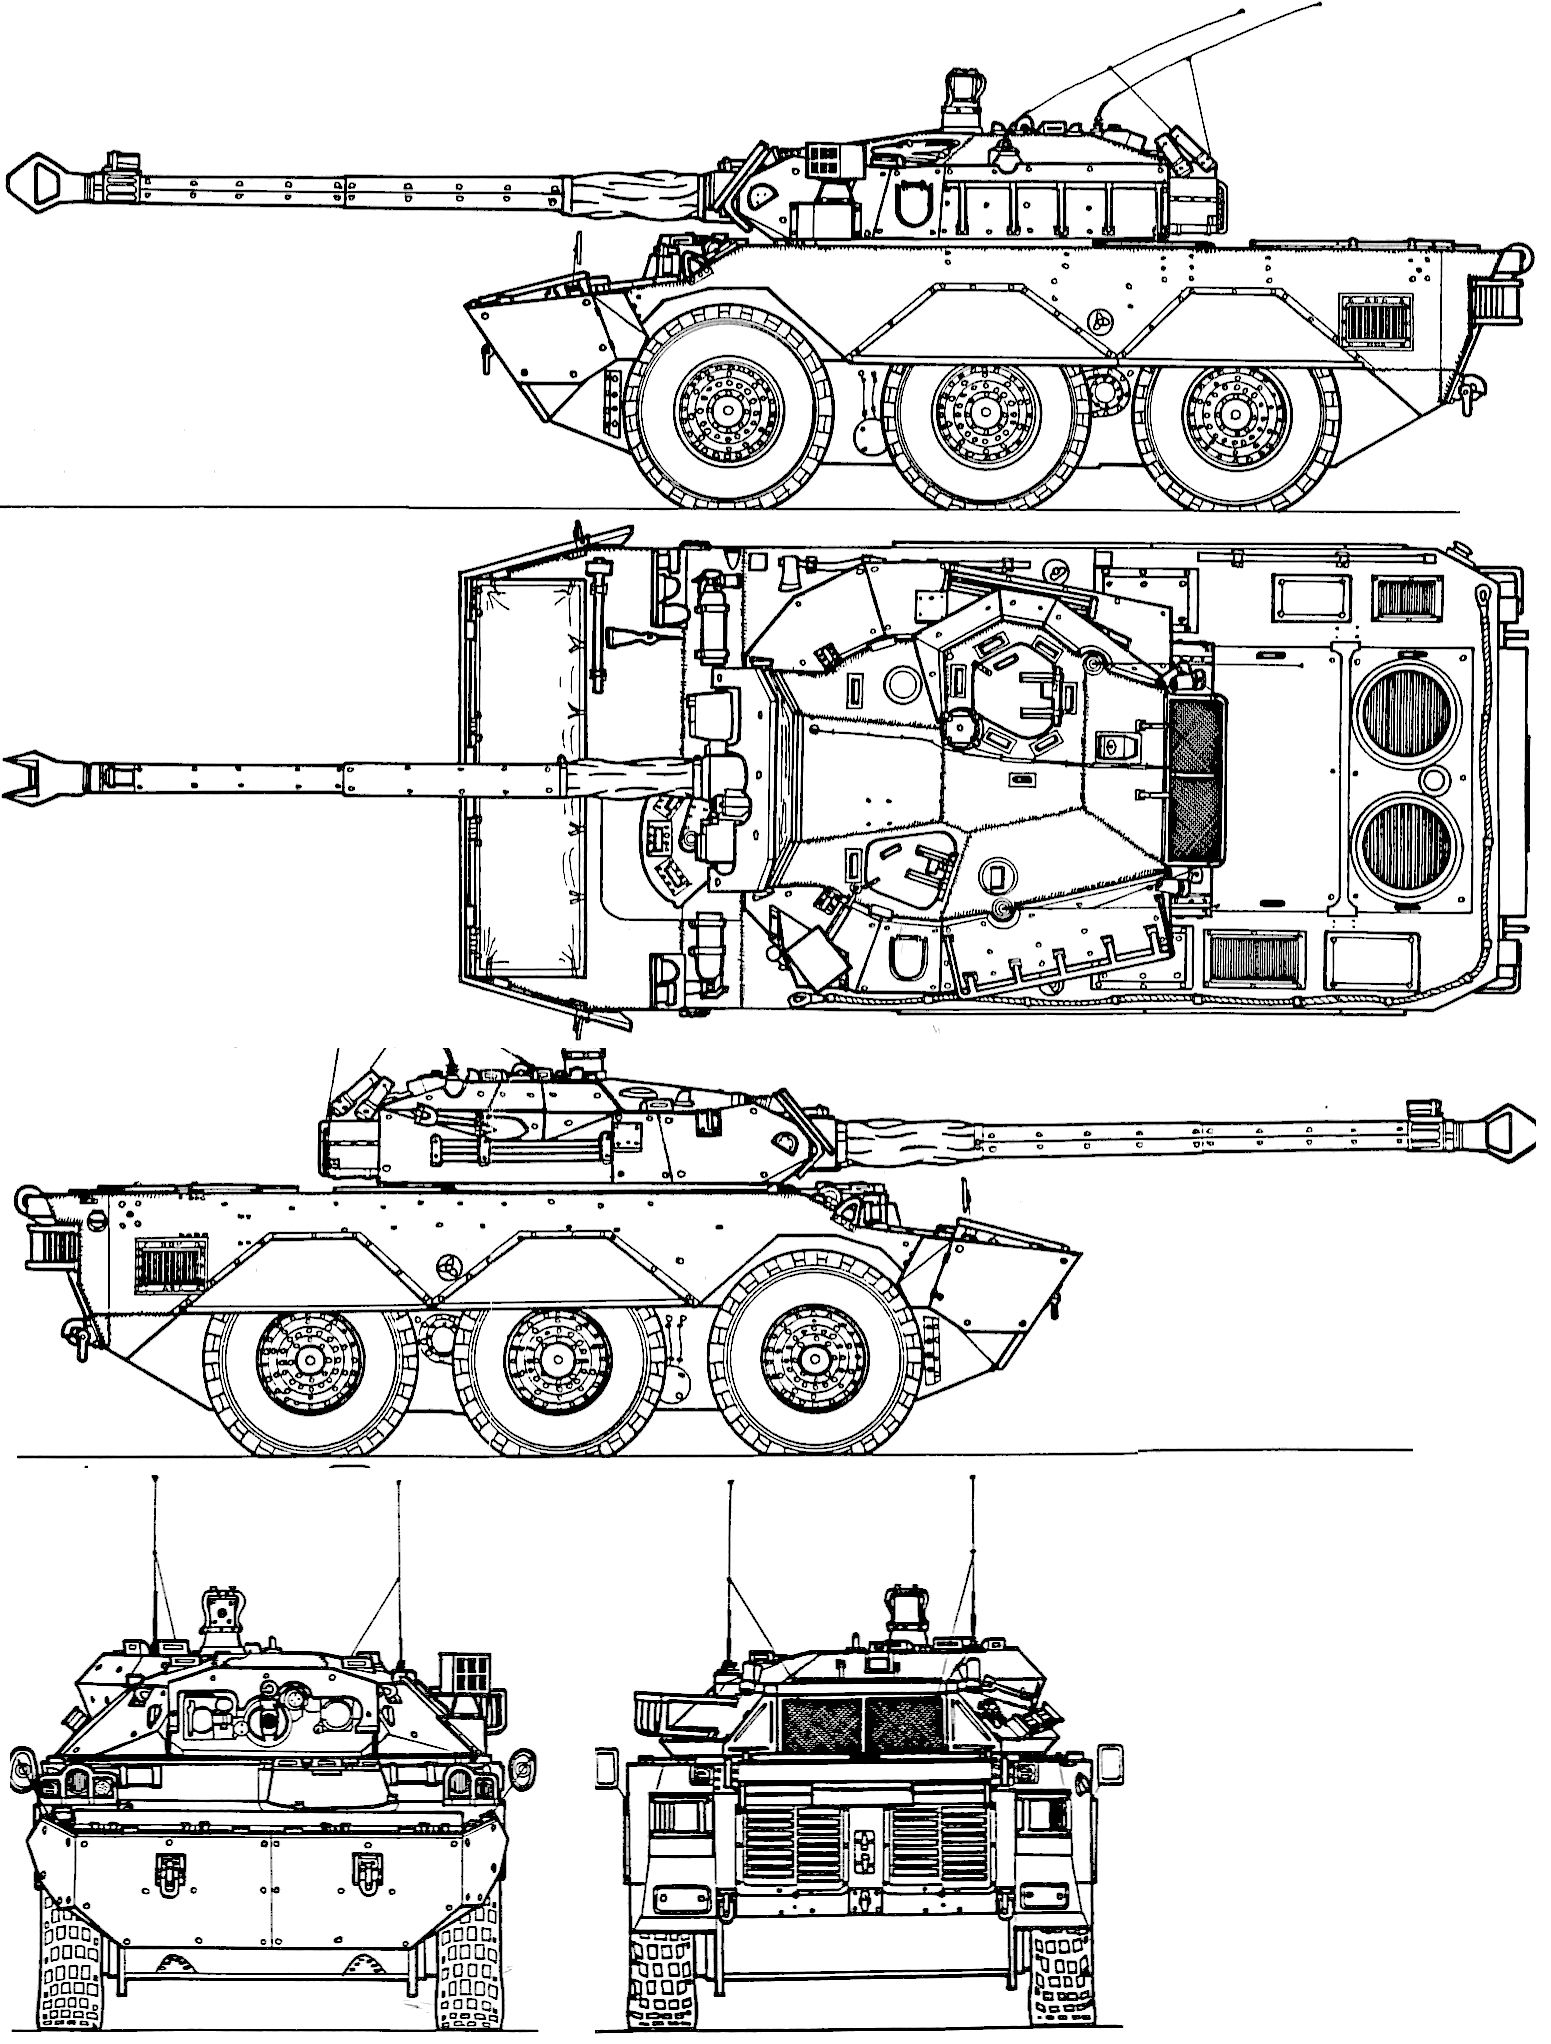 Kv2 Blueprint Plan Vehculos Tanks Wwii Military Vehicles Y